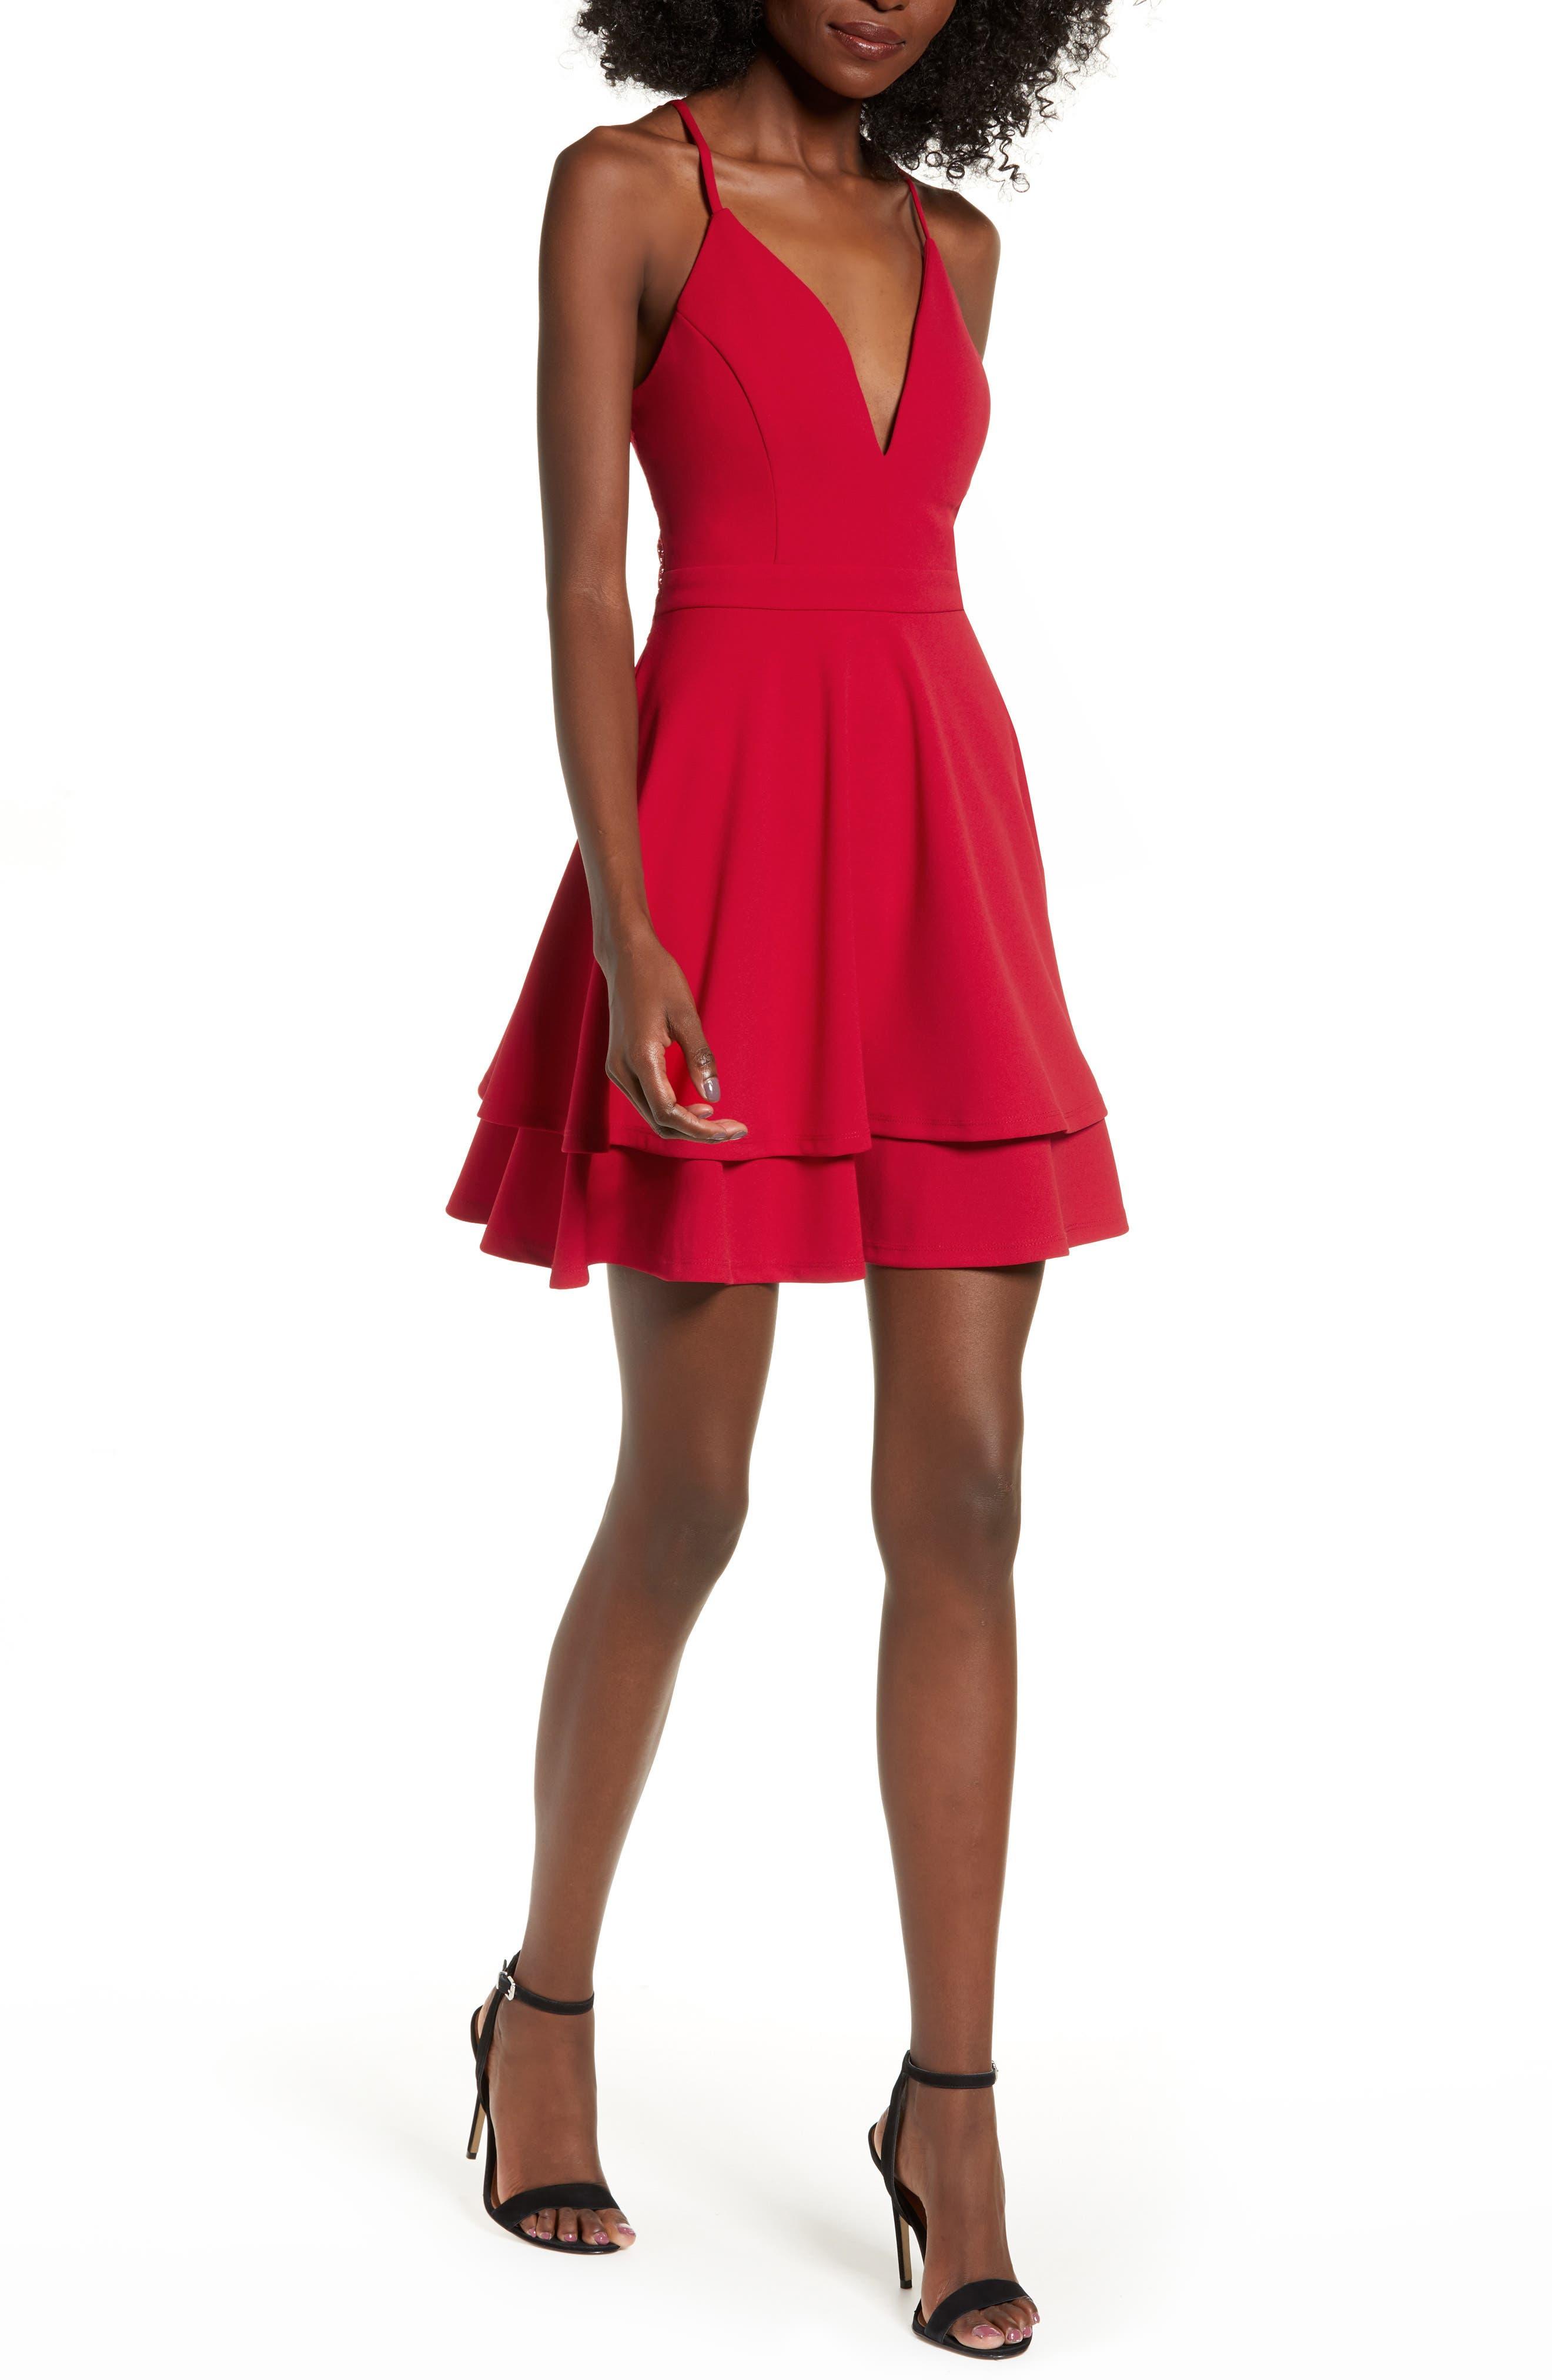 LOVE, NICKIE LEW V-Neck Skater Dress, Main, color, RED